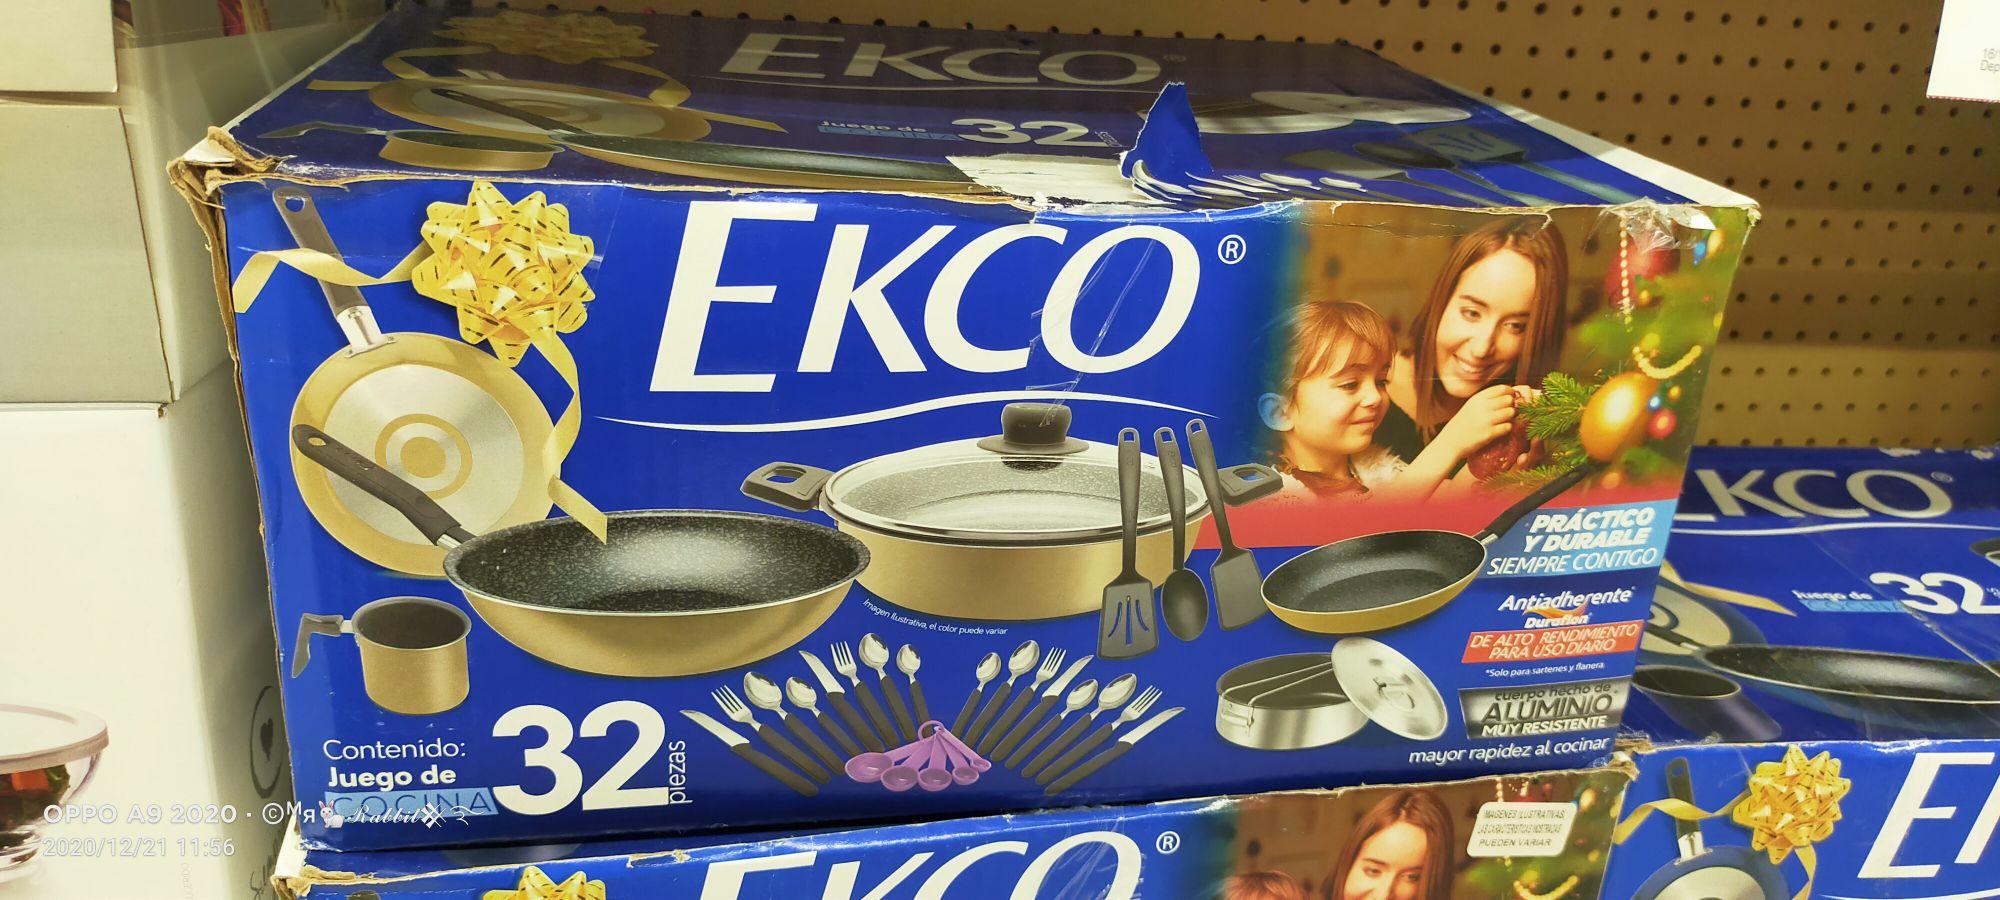 Bodega Aurrera: Batería de cocina Ekco 32 piezas